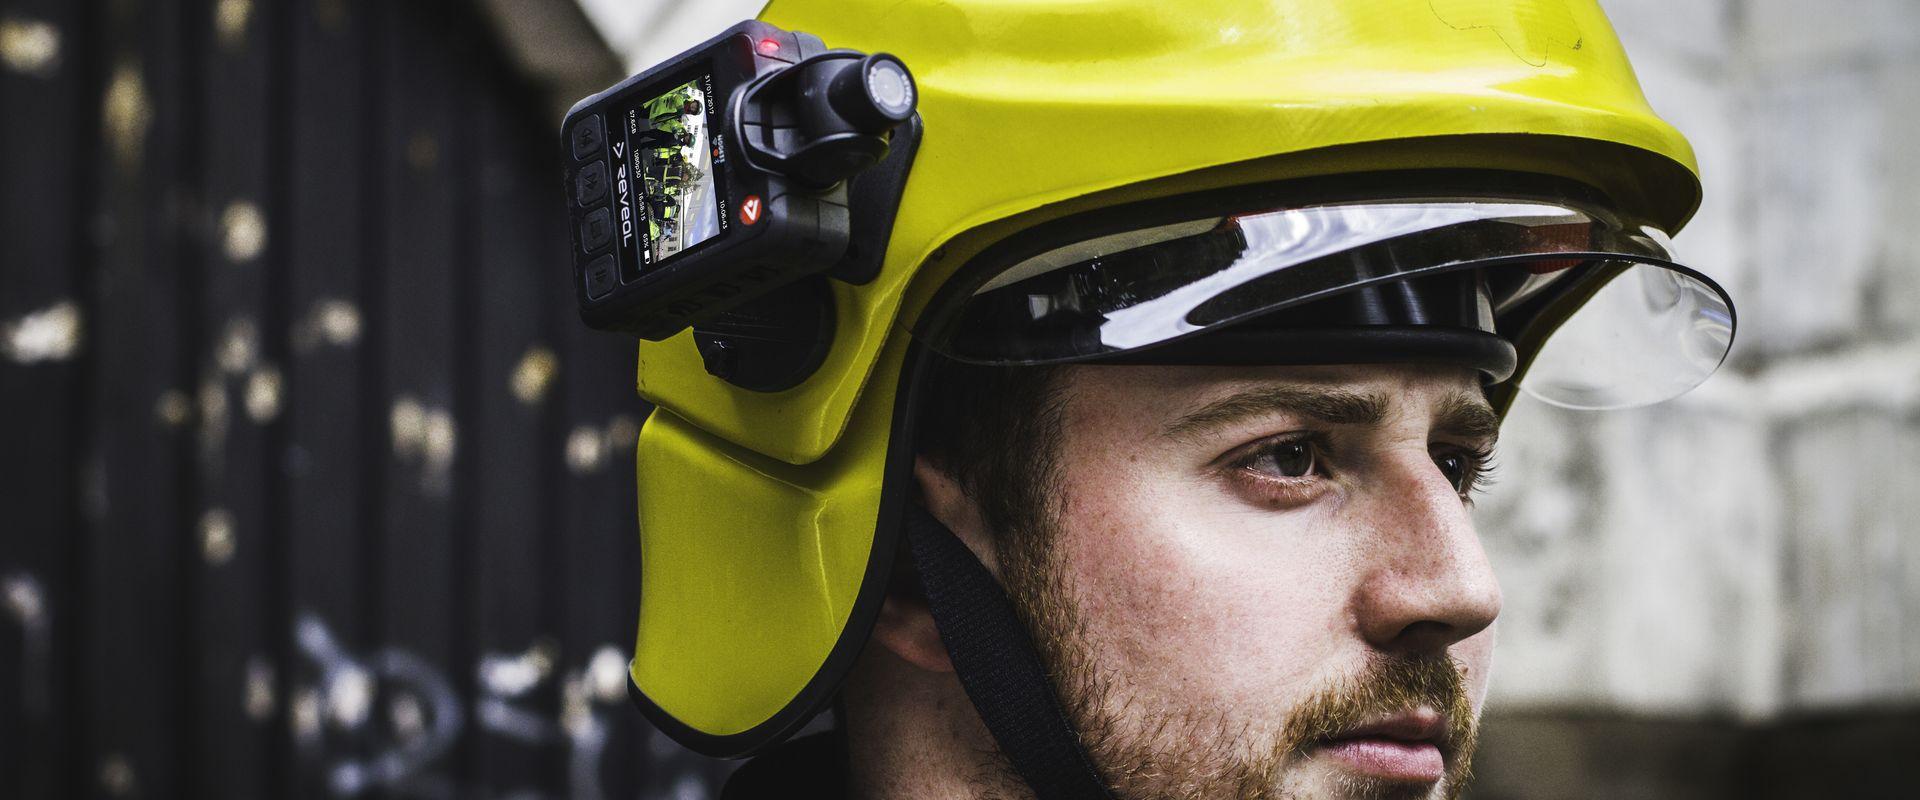 Body Cameras in the Fire Service